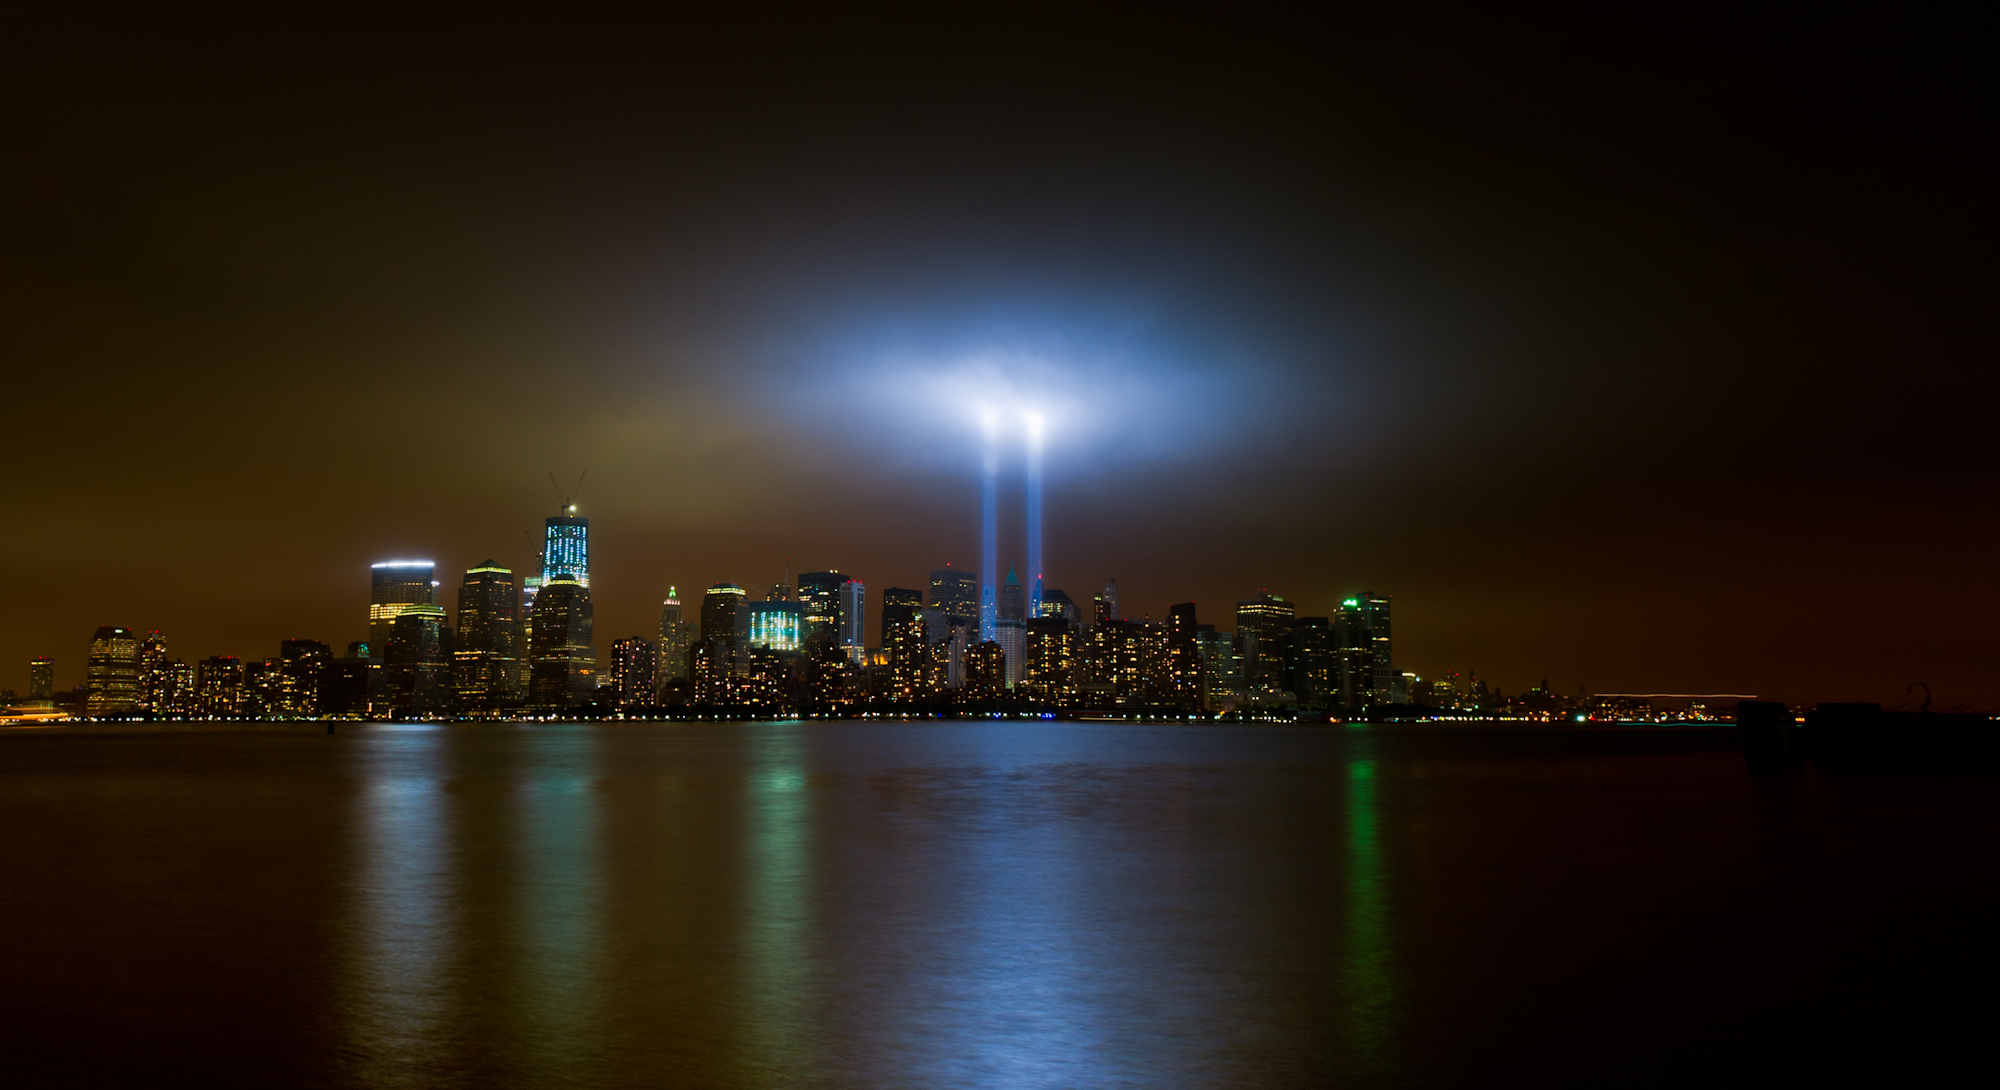 REFUGE Reflections 9-11: NEVER FORGET